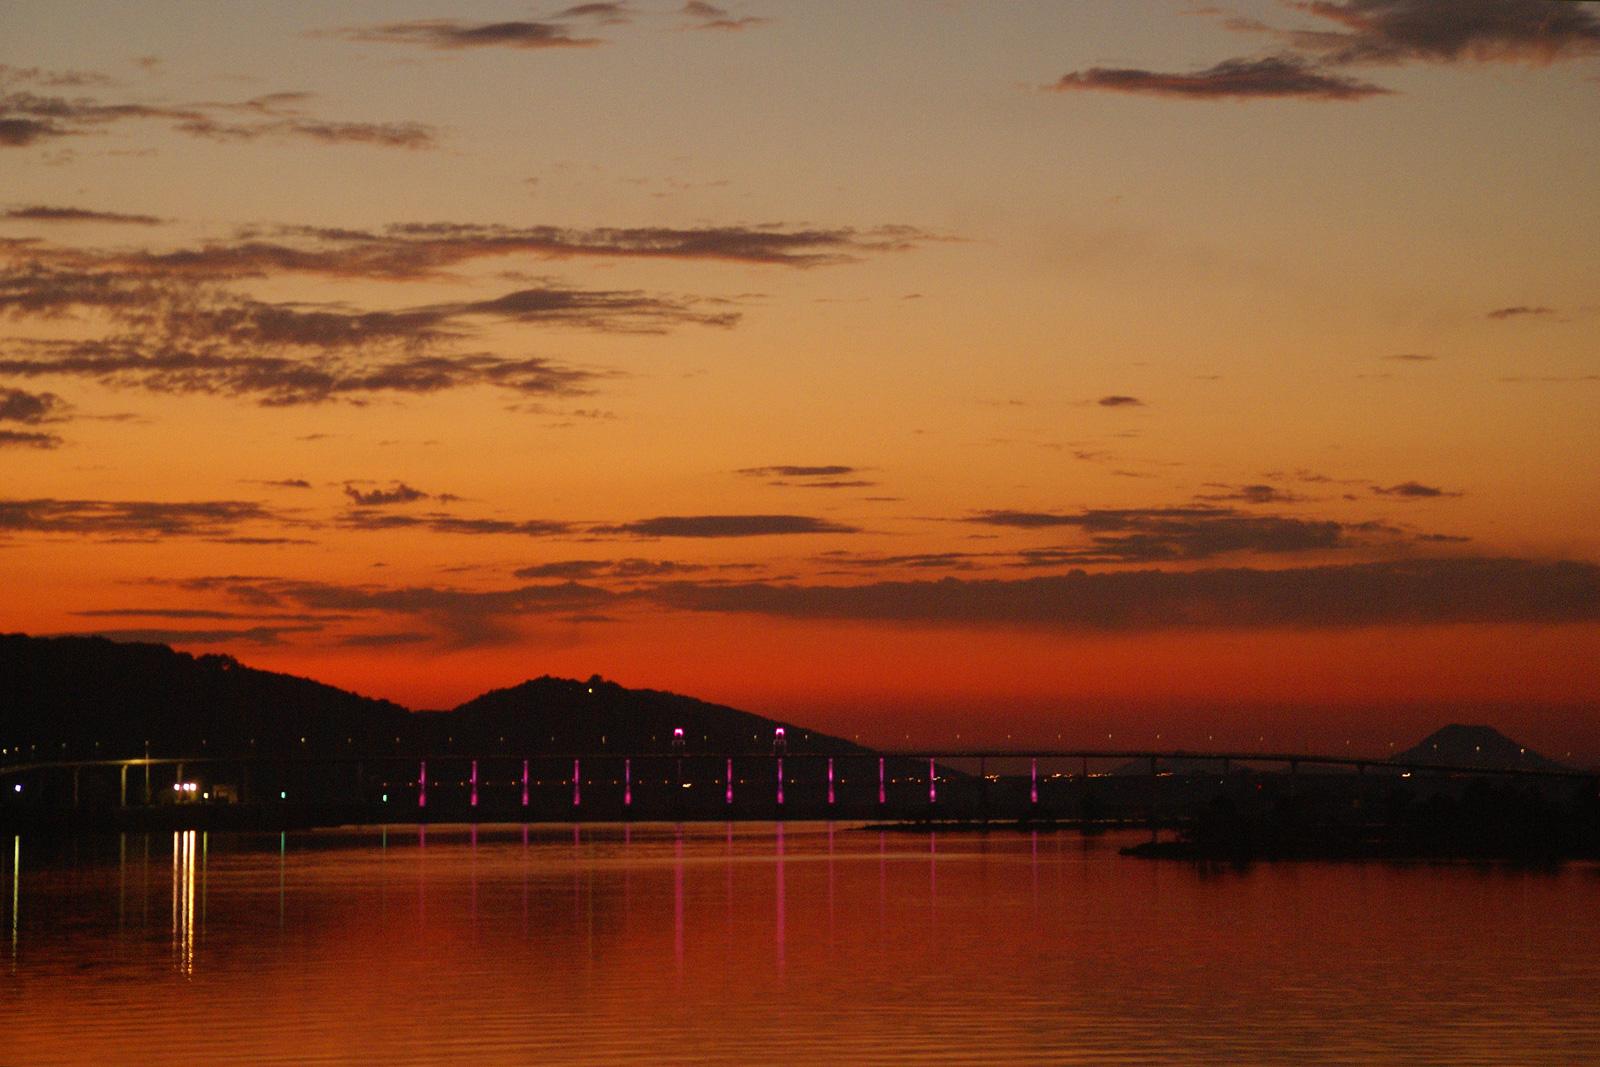 Click image for larger version  Name:DSC00662-Sunset-5_sm.jpg Views:70 Size:637.7 KB ID:69203